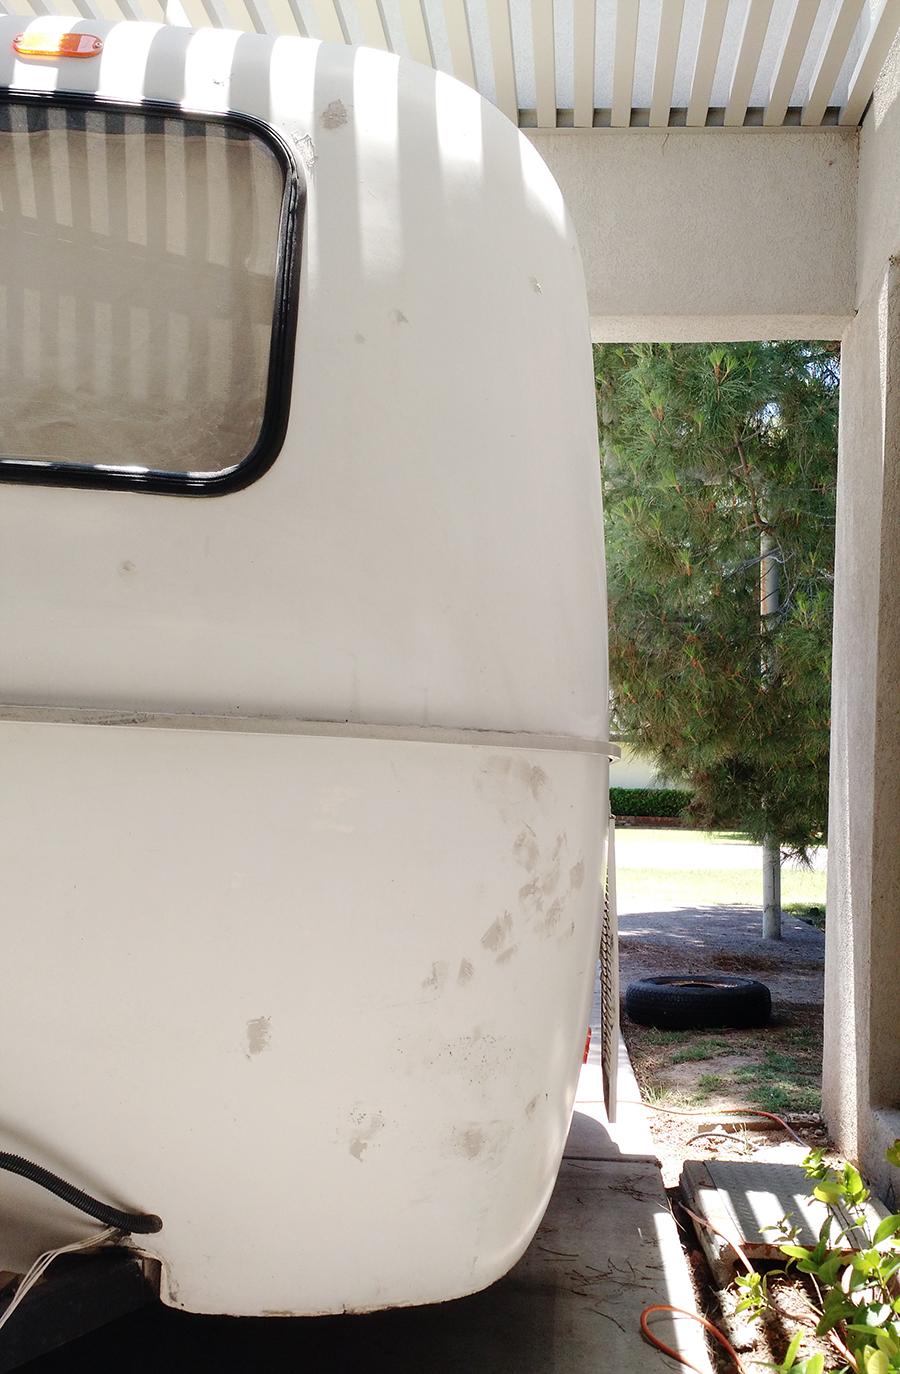 Fiberglass RV Scamp Remodel - littleladylittlecity.com